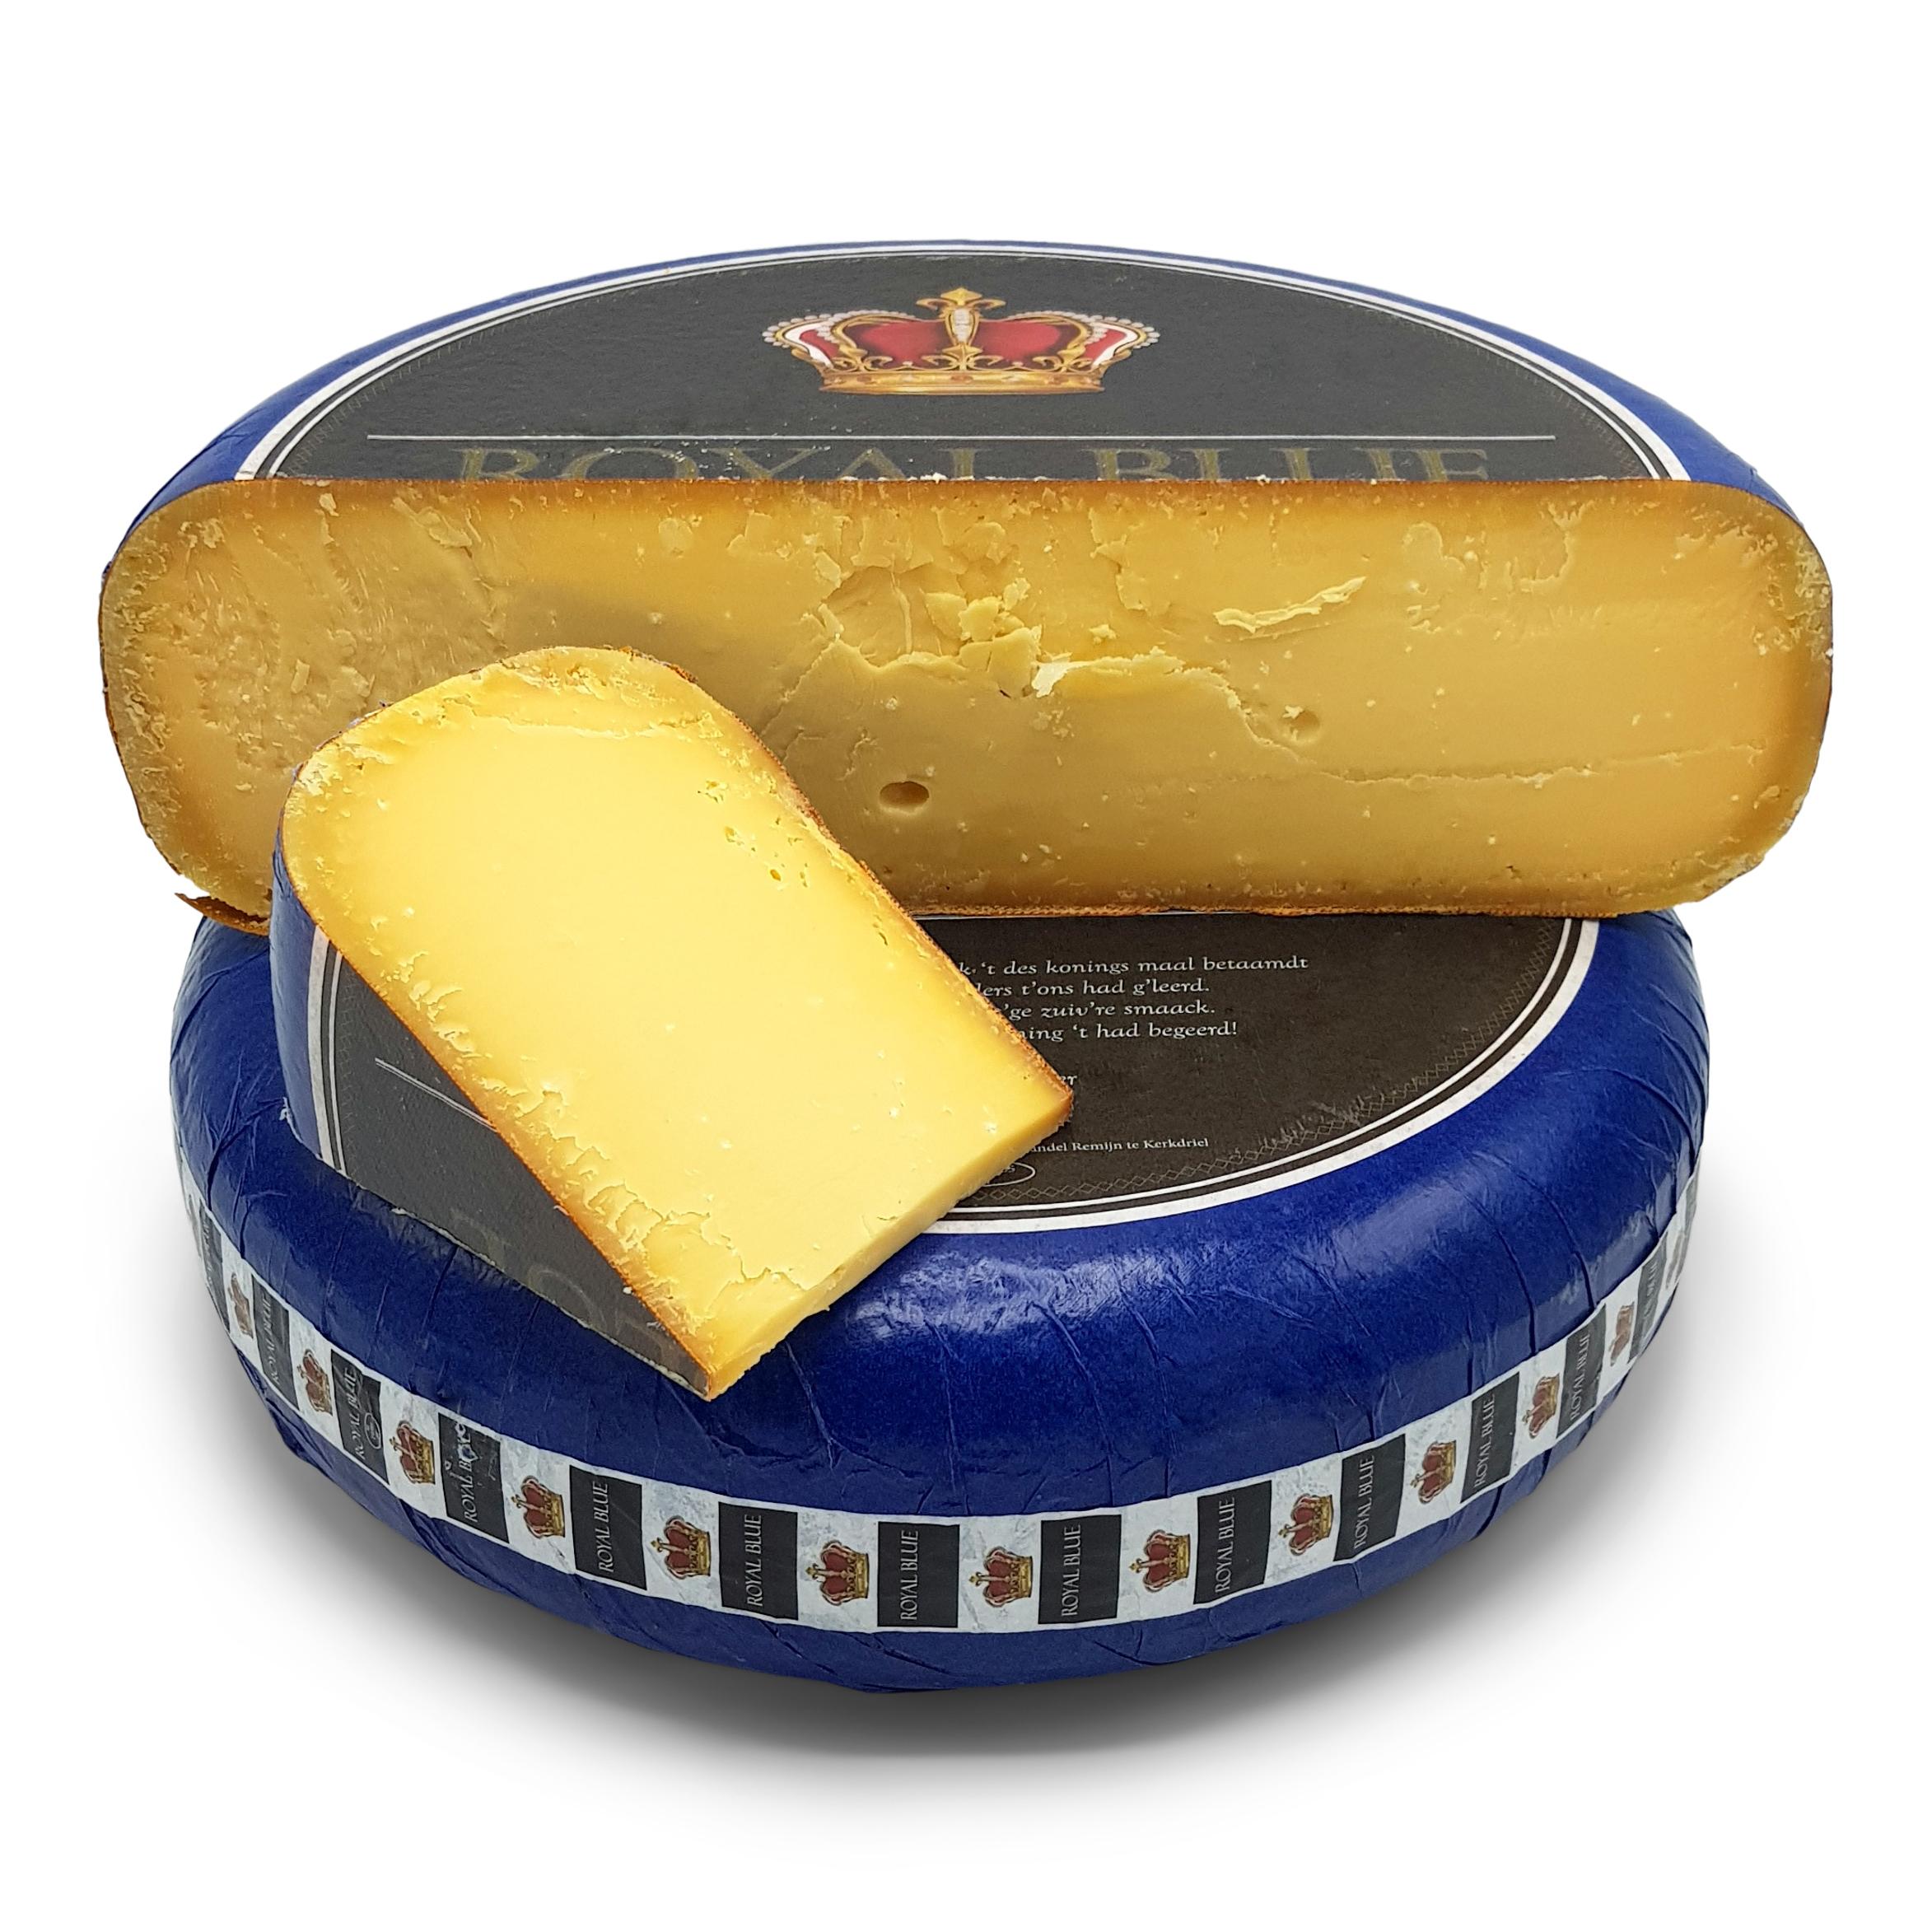 Overjarige kaas (+/- 1 tot 2 jaar gerijpt)